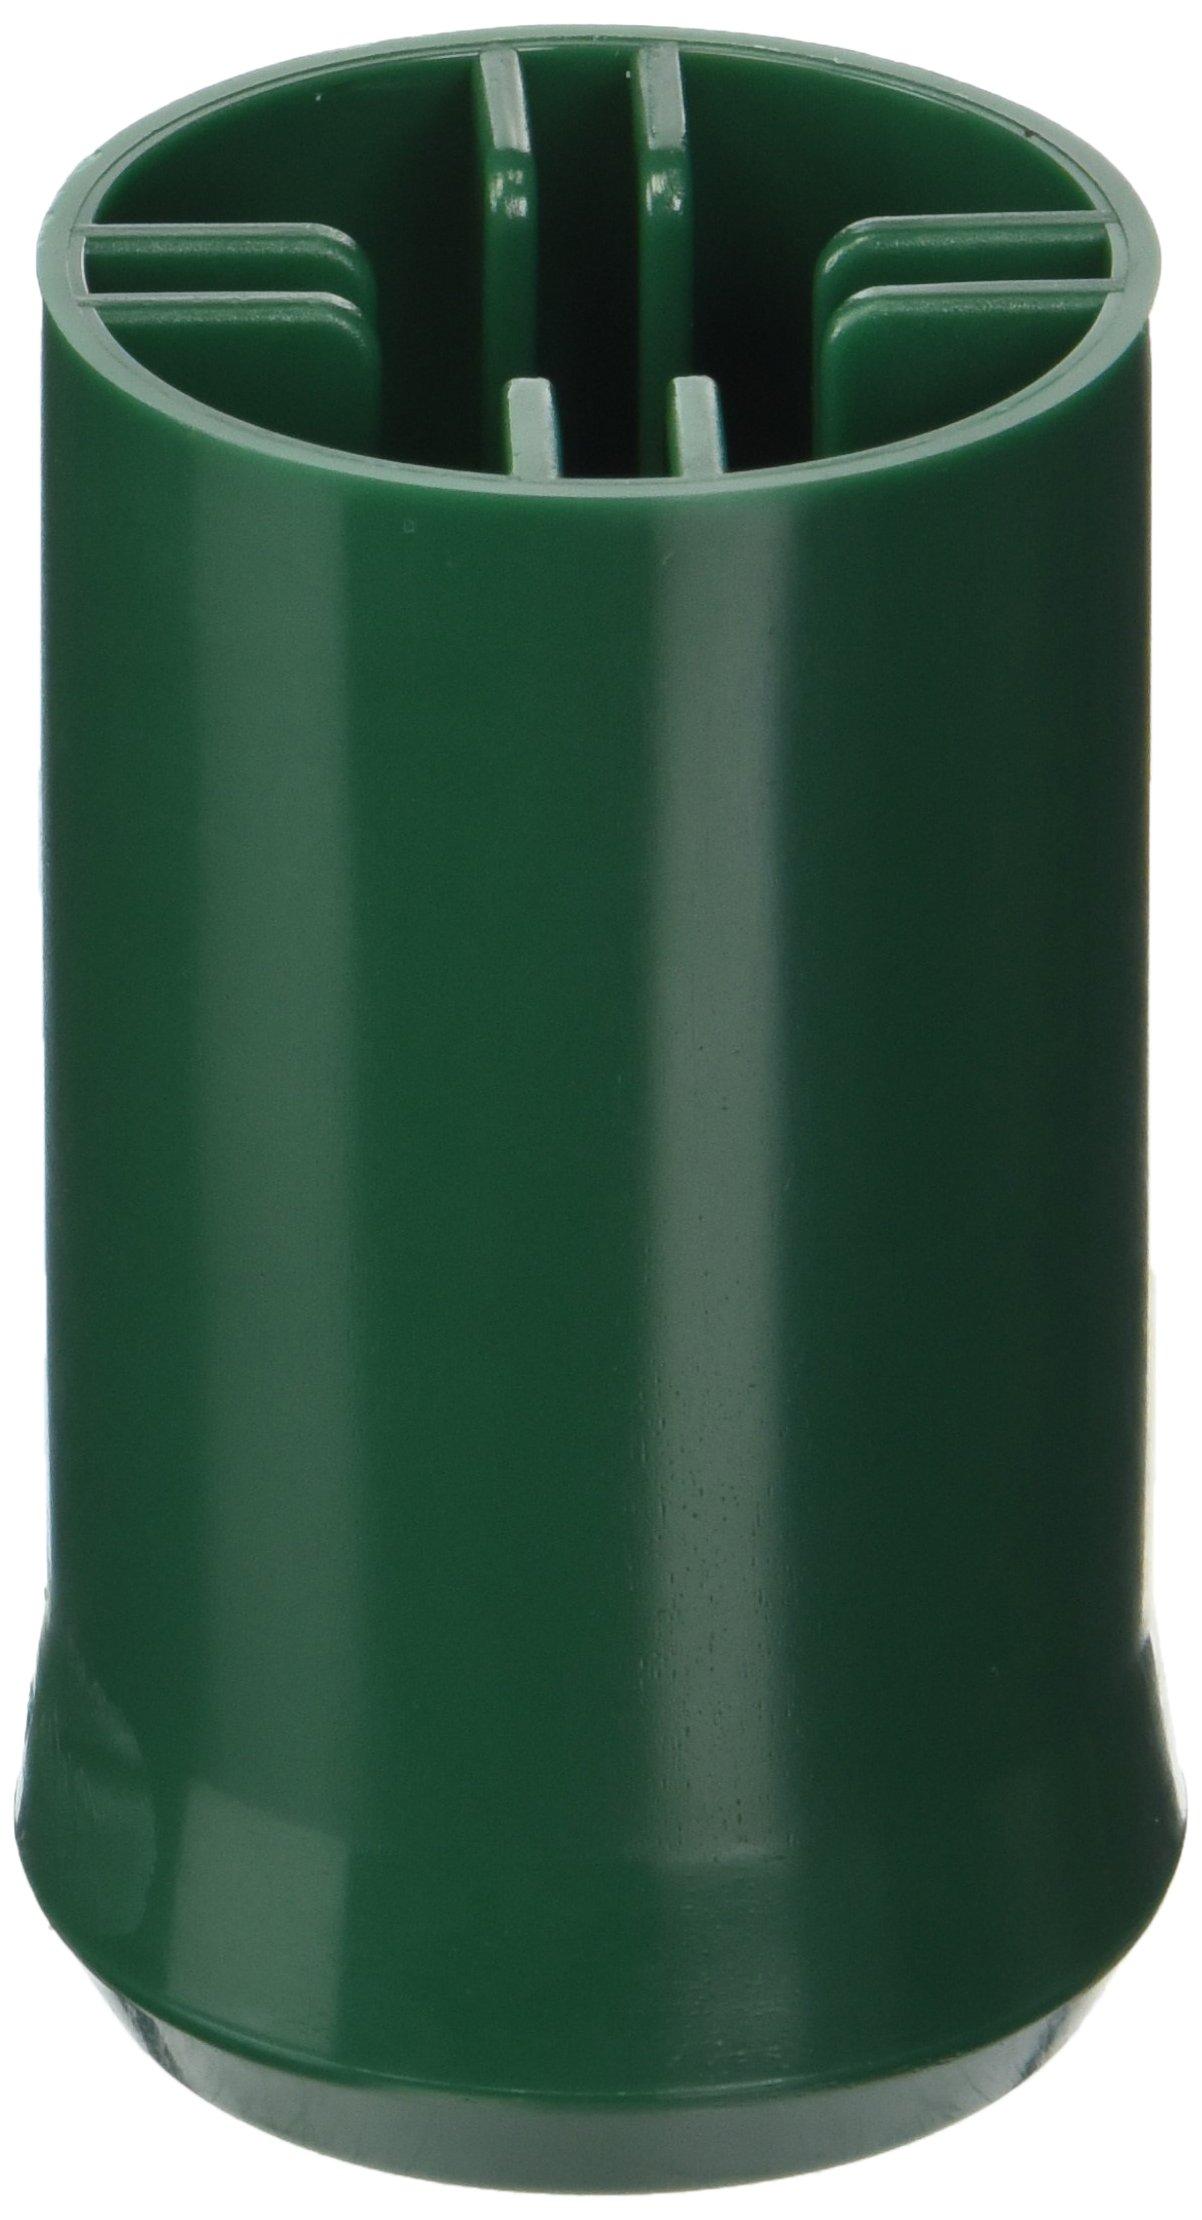 Stake-SAFE 1007G 10 Per Bag, 4x2, Green